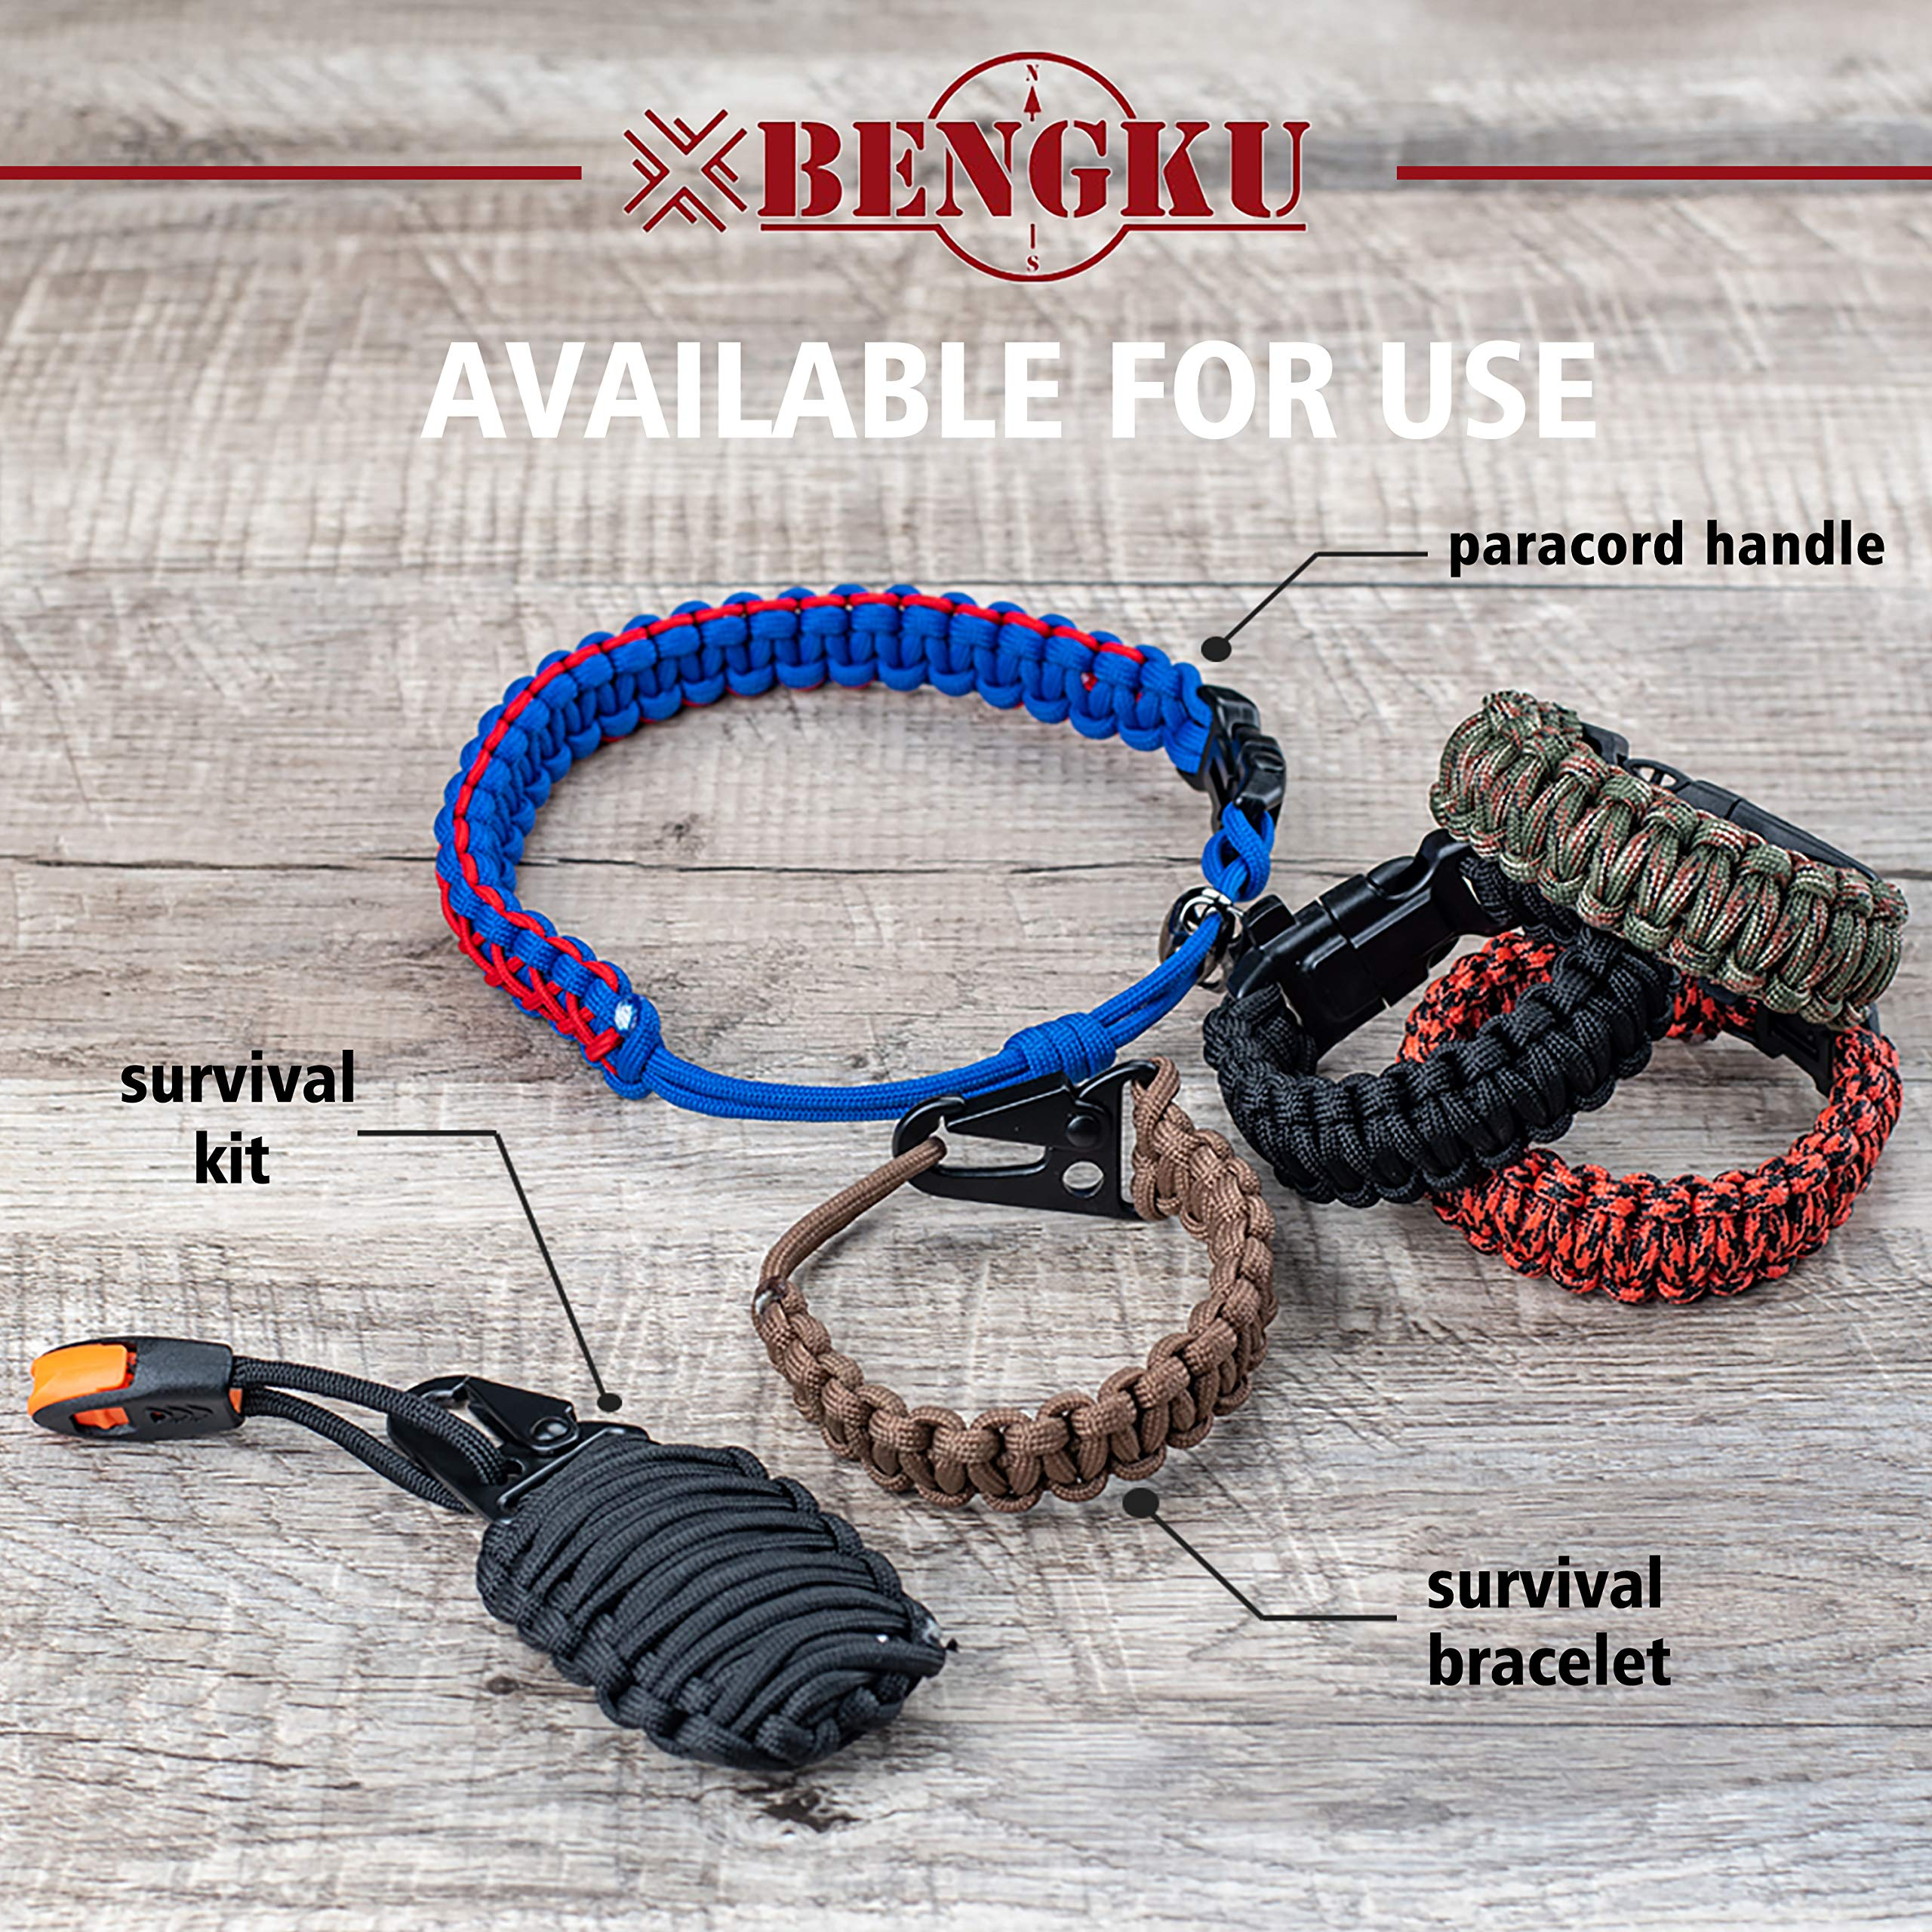 BENGKU Outdoor Survival Mil-SPEC 550lb Paracord/Parachute Cord(MIl-C-5040-H),100Feet,100% Nylon. (Yellow, 100.00) by BENGKU (Image #6)